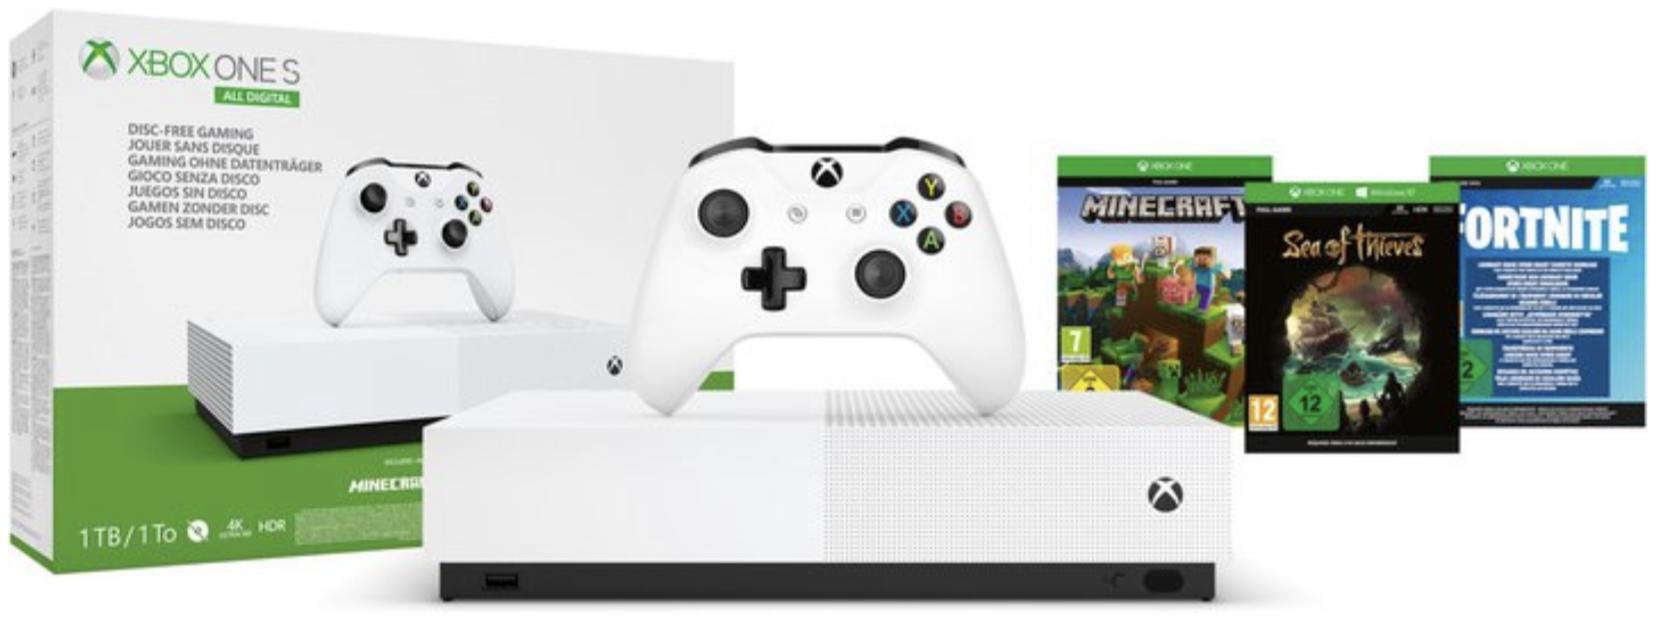 Microsoft Xbox One S 1TB All Digital Edition + Minecraft, Sea of Thieves, Fortnite Battle für 129€ bei Abholung oder 133,99€ inkl. Versand